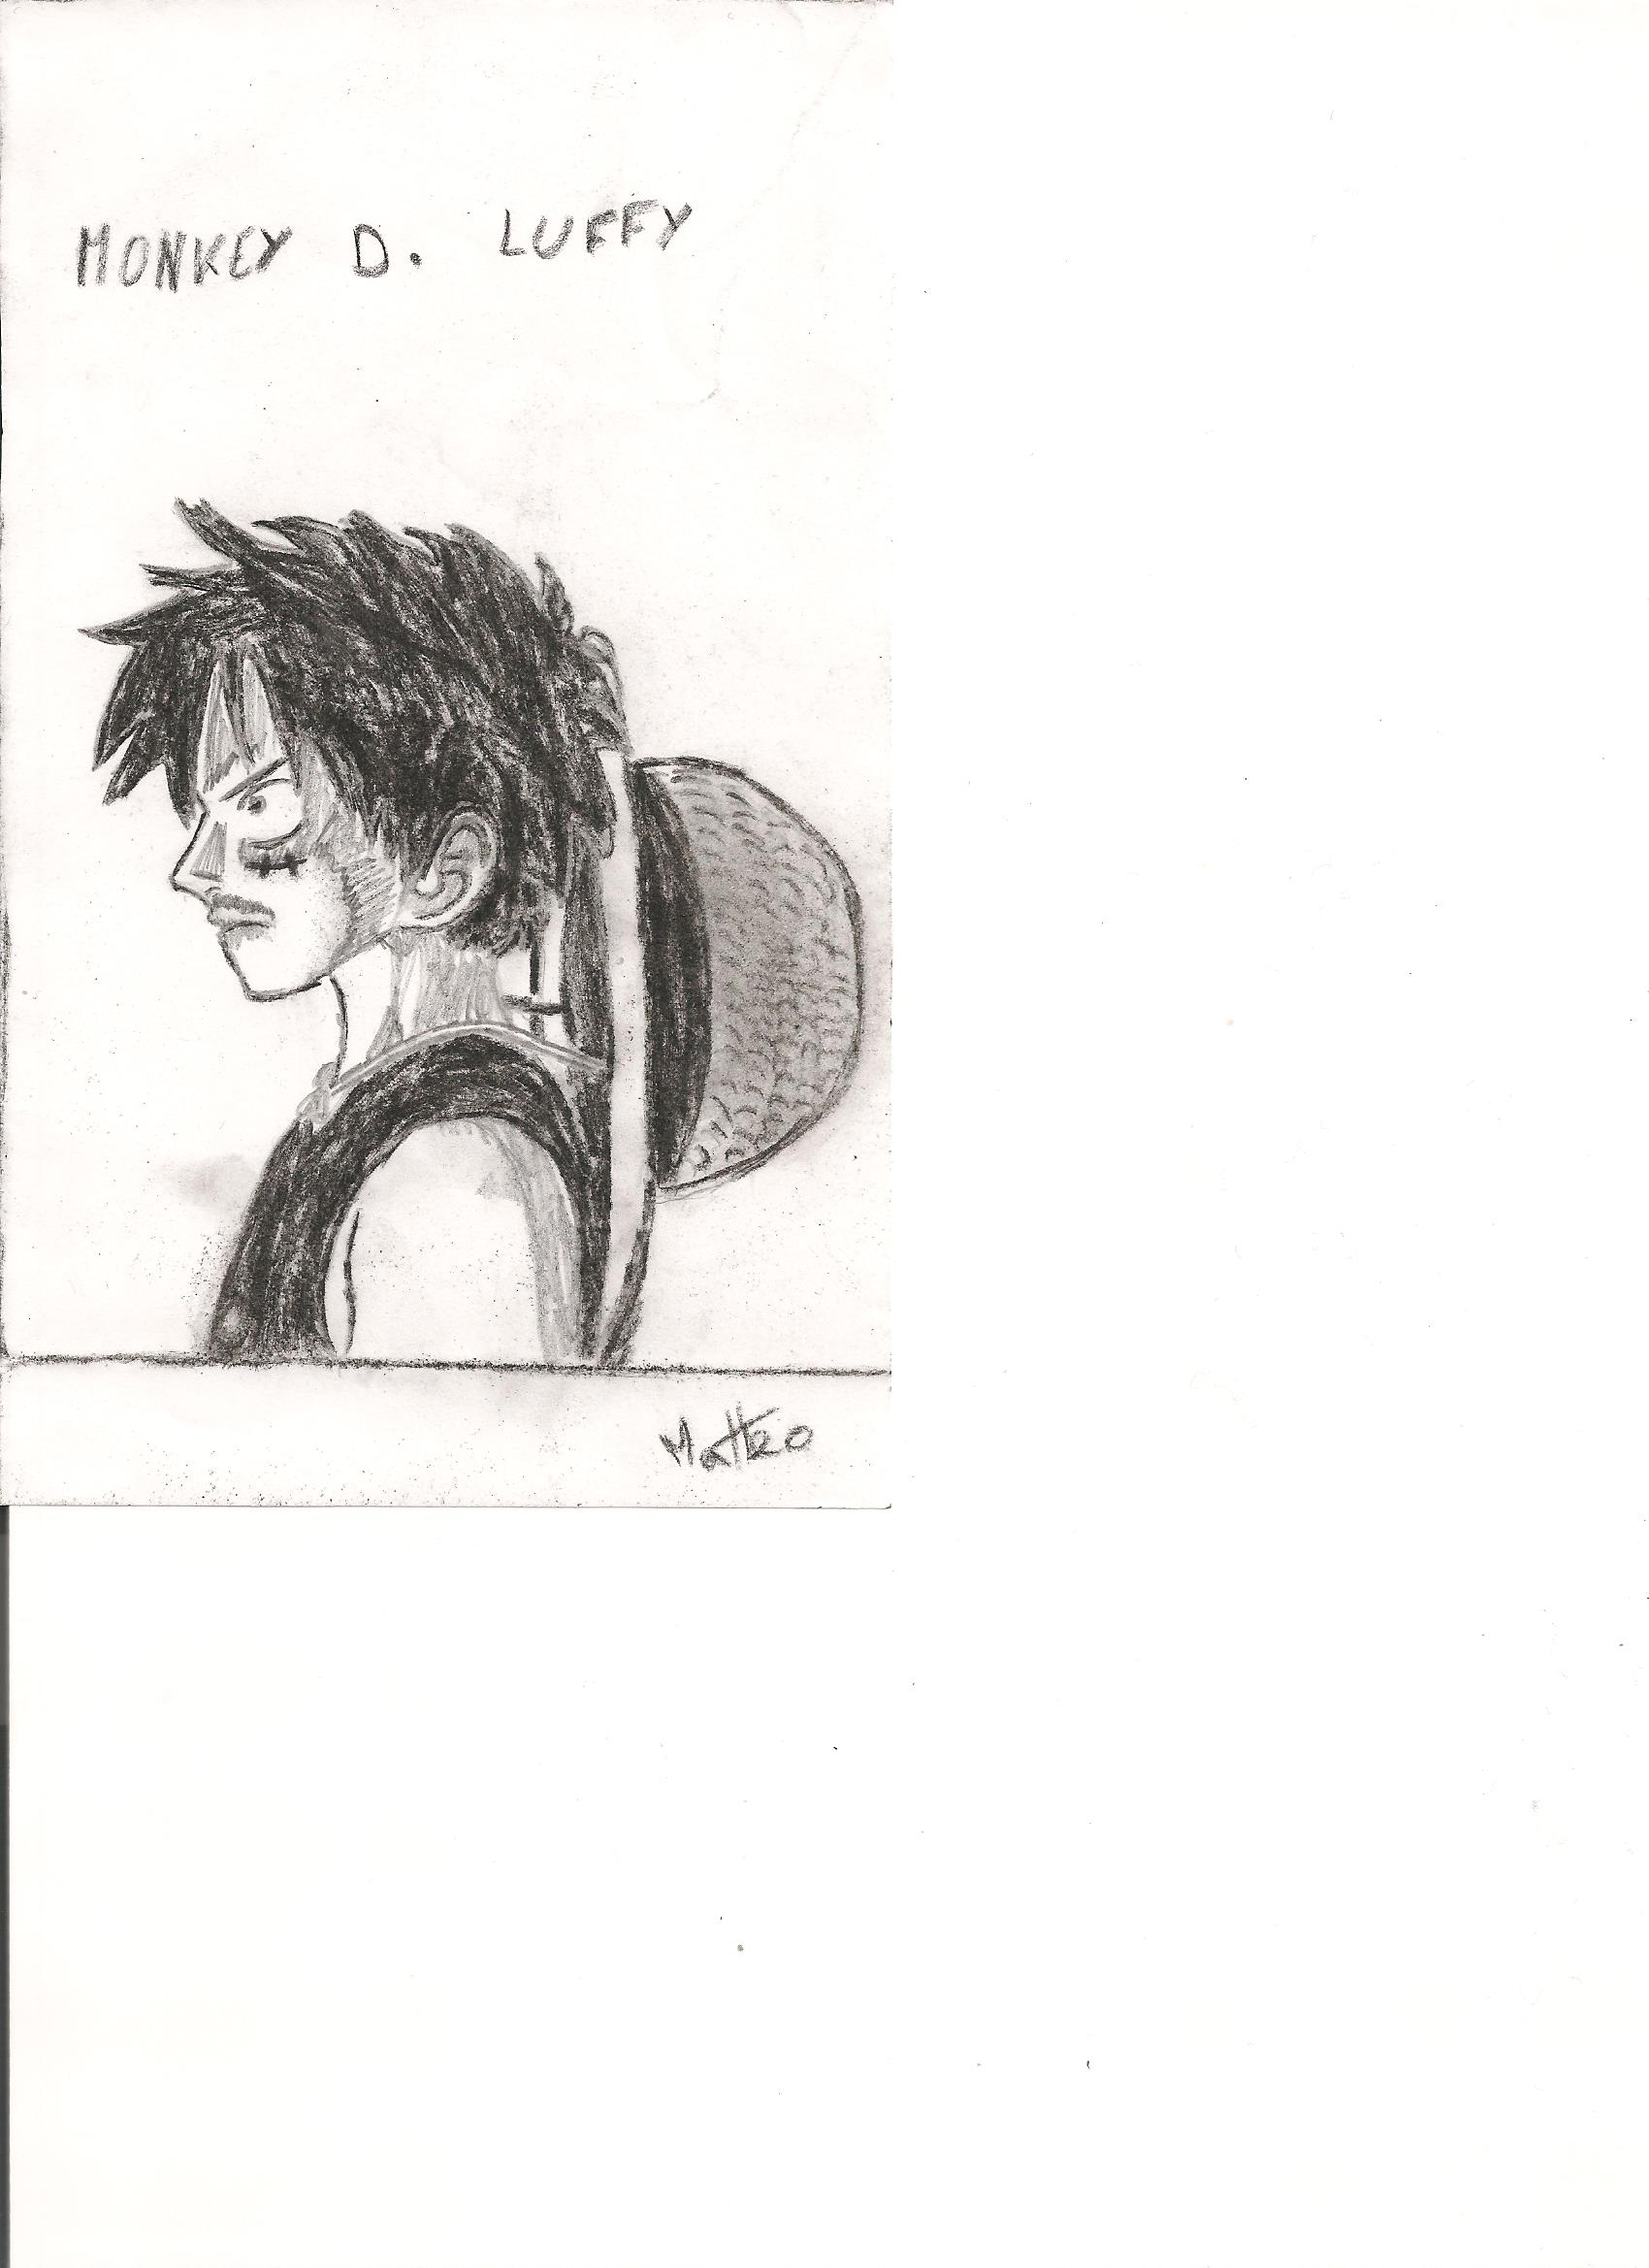 Dessin Monckey .D. Luffy de Kizla